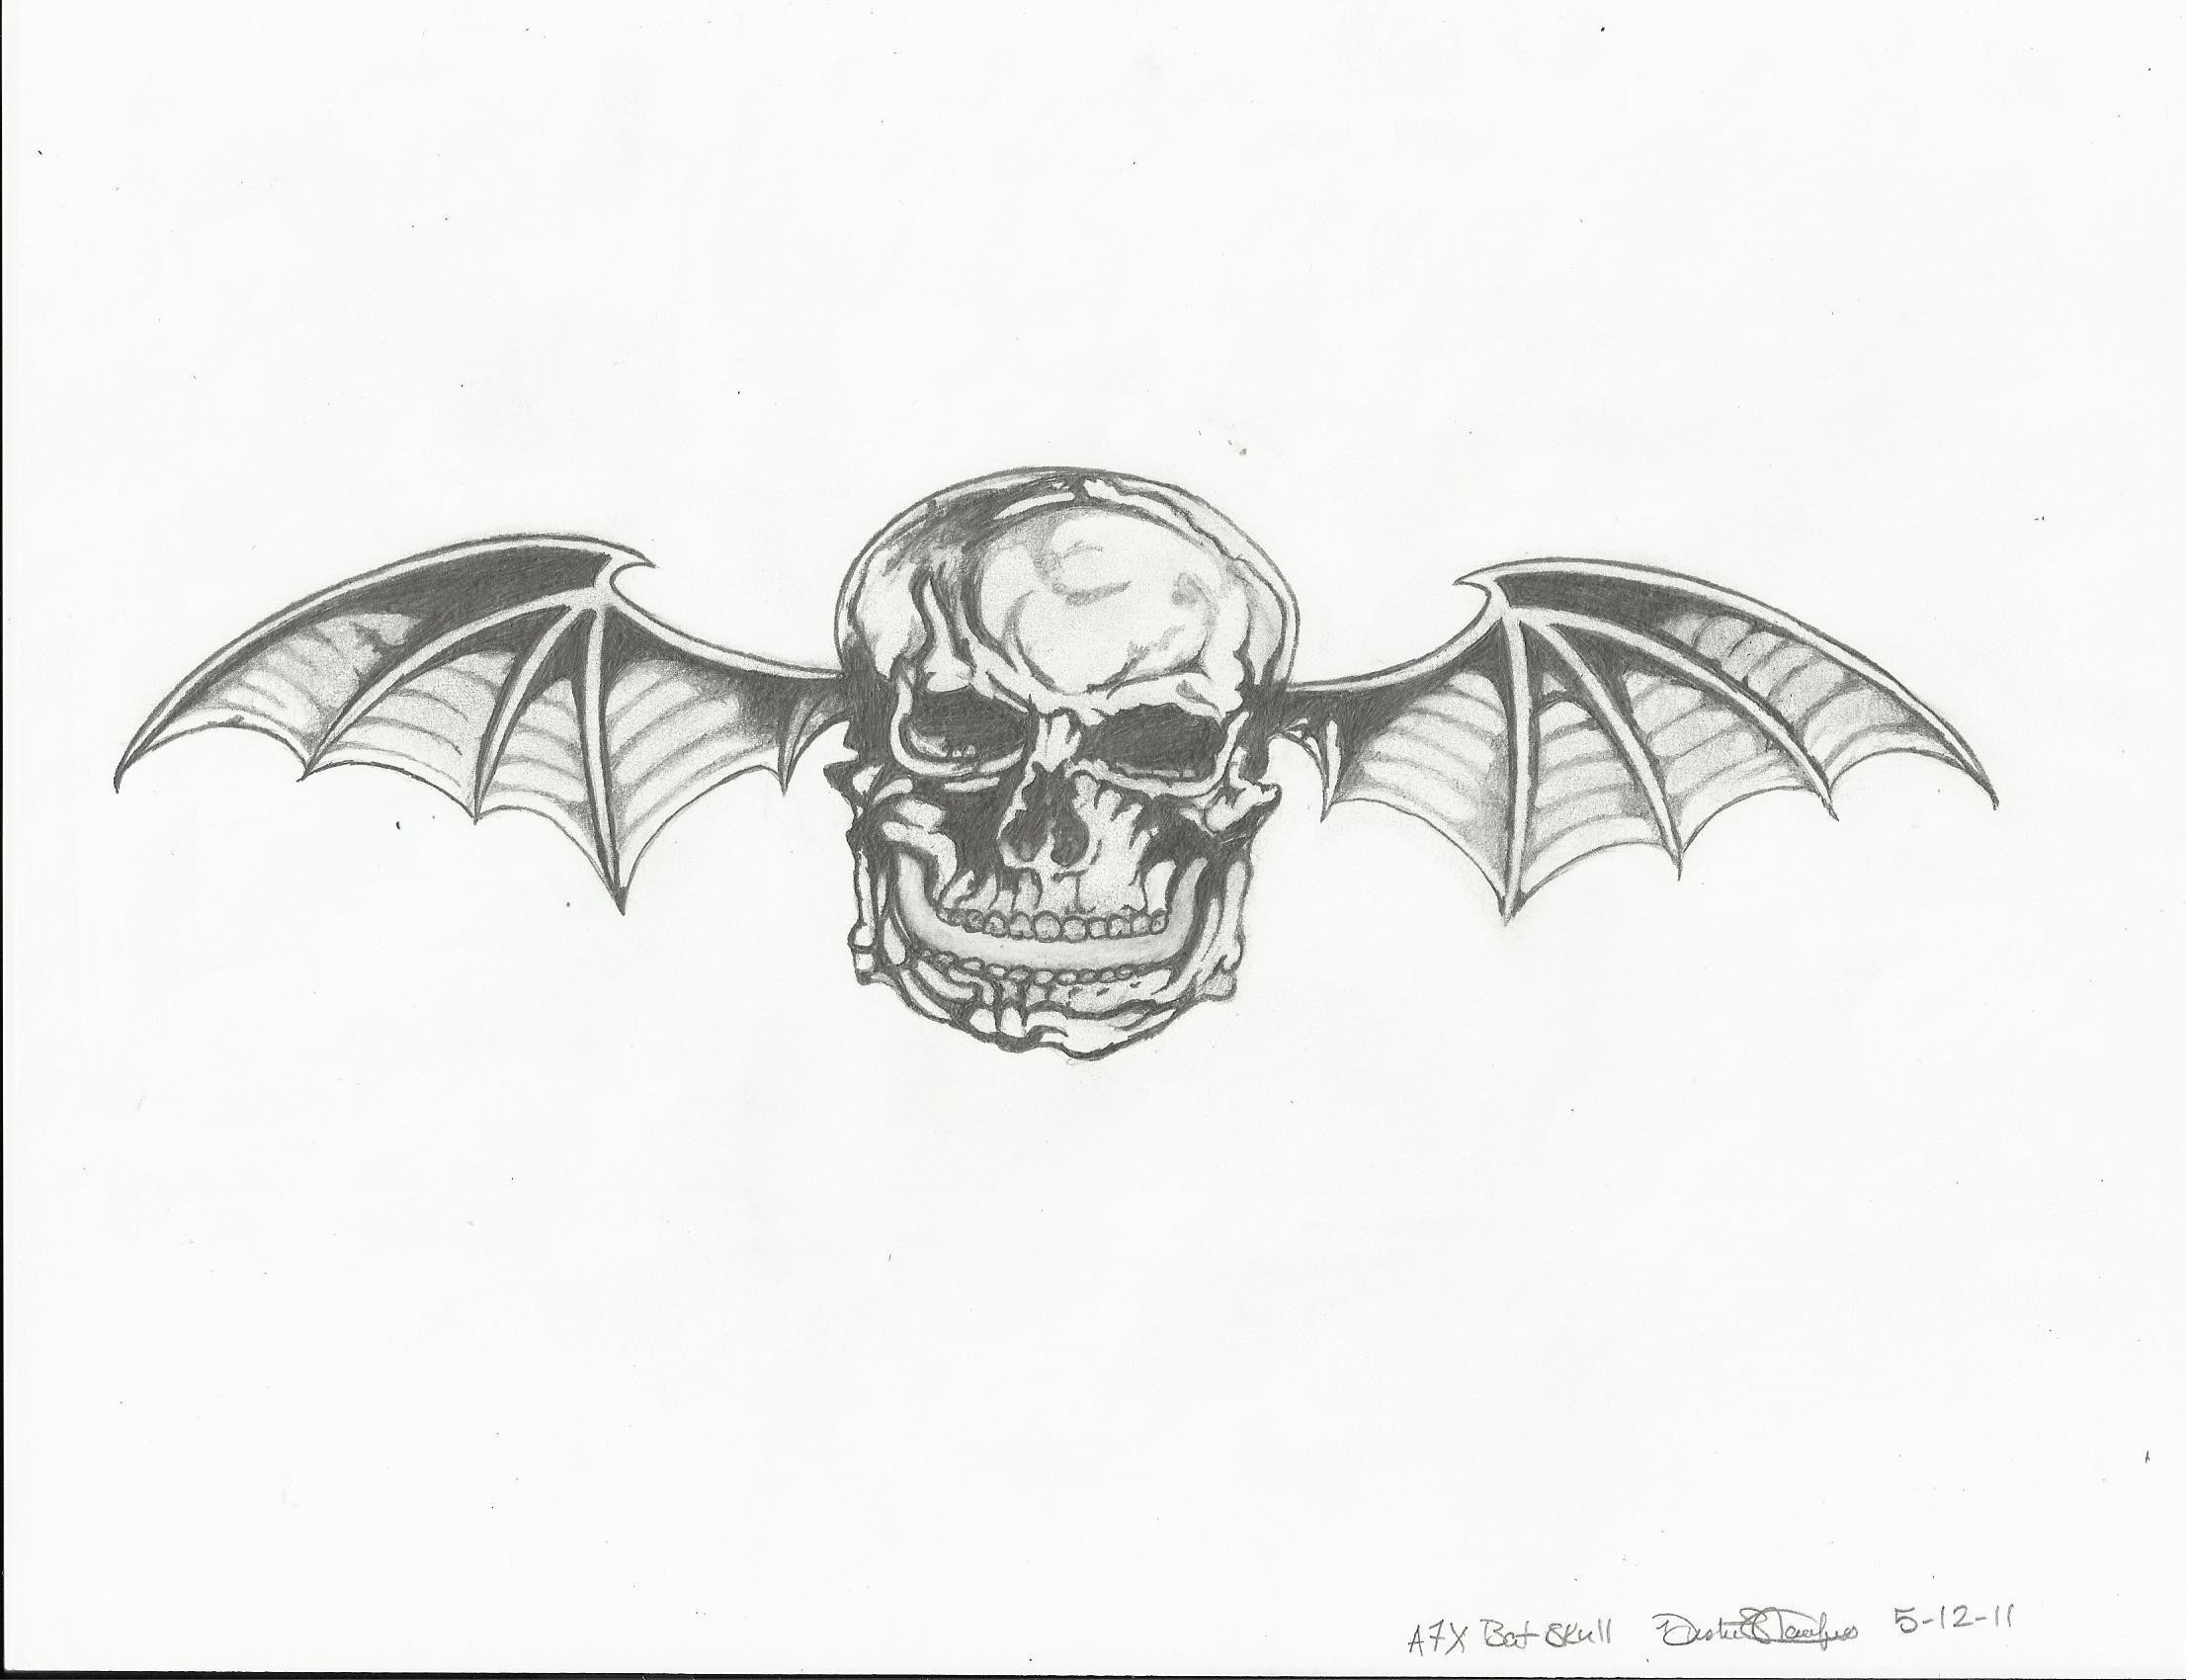 #5 A7X Deathbat Avenged Sevenfold Fan Art 22952563 Fanpop